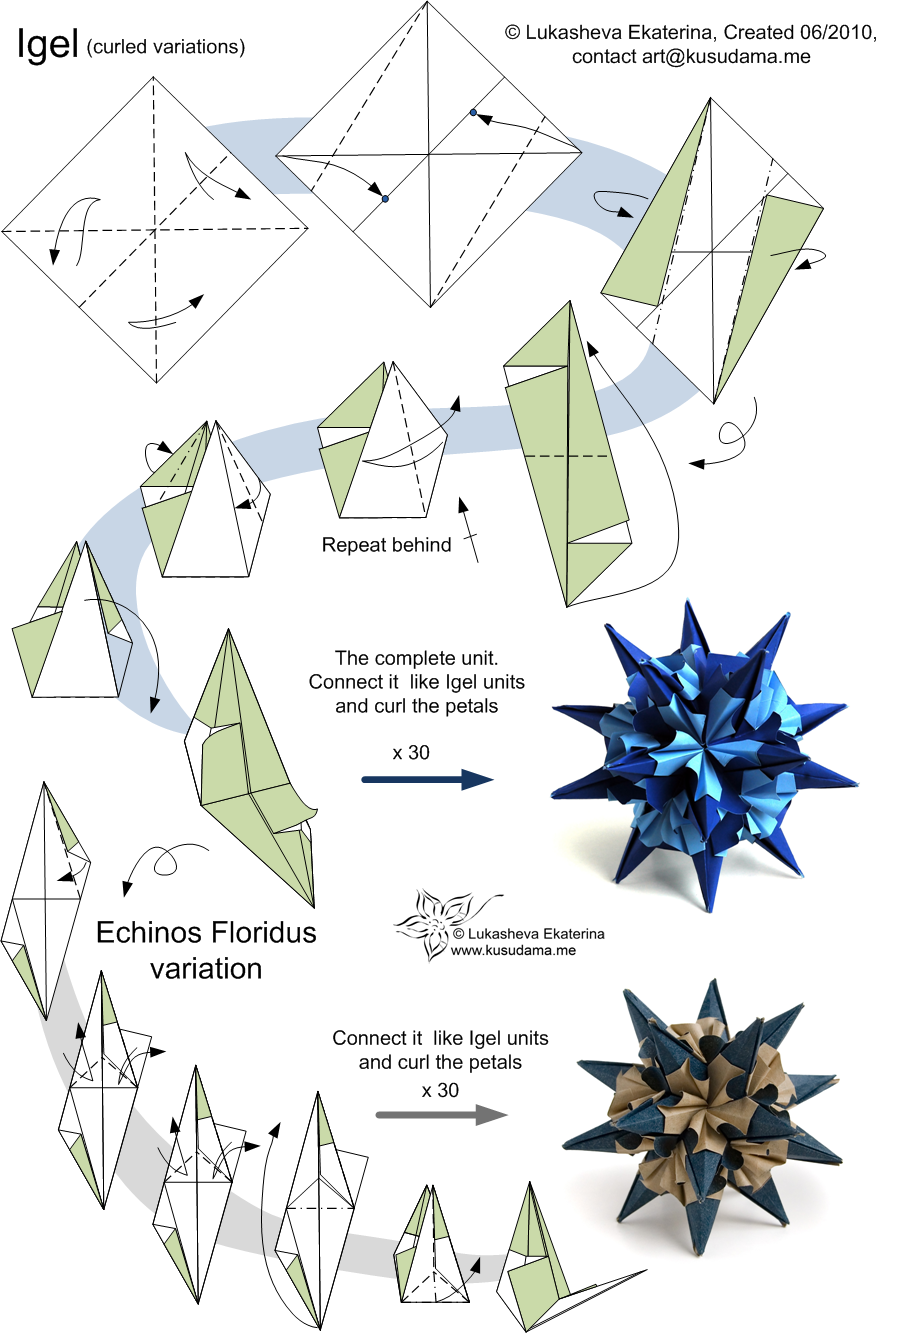 kusudama me modular origami origami pinterest modular rh pinterest com origami modular diagrams origami modular diagrams